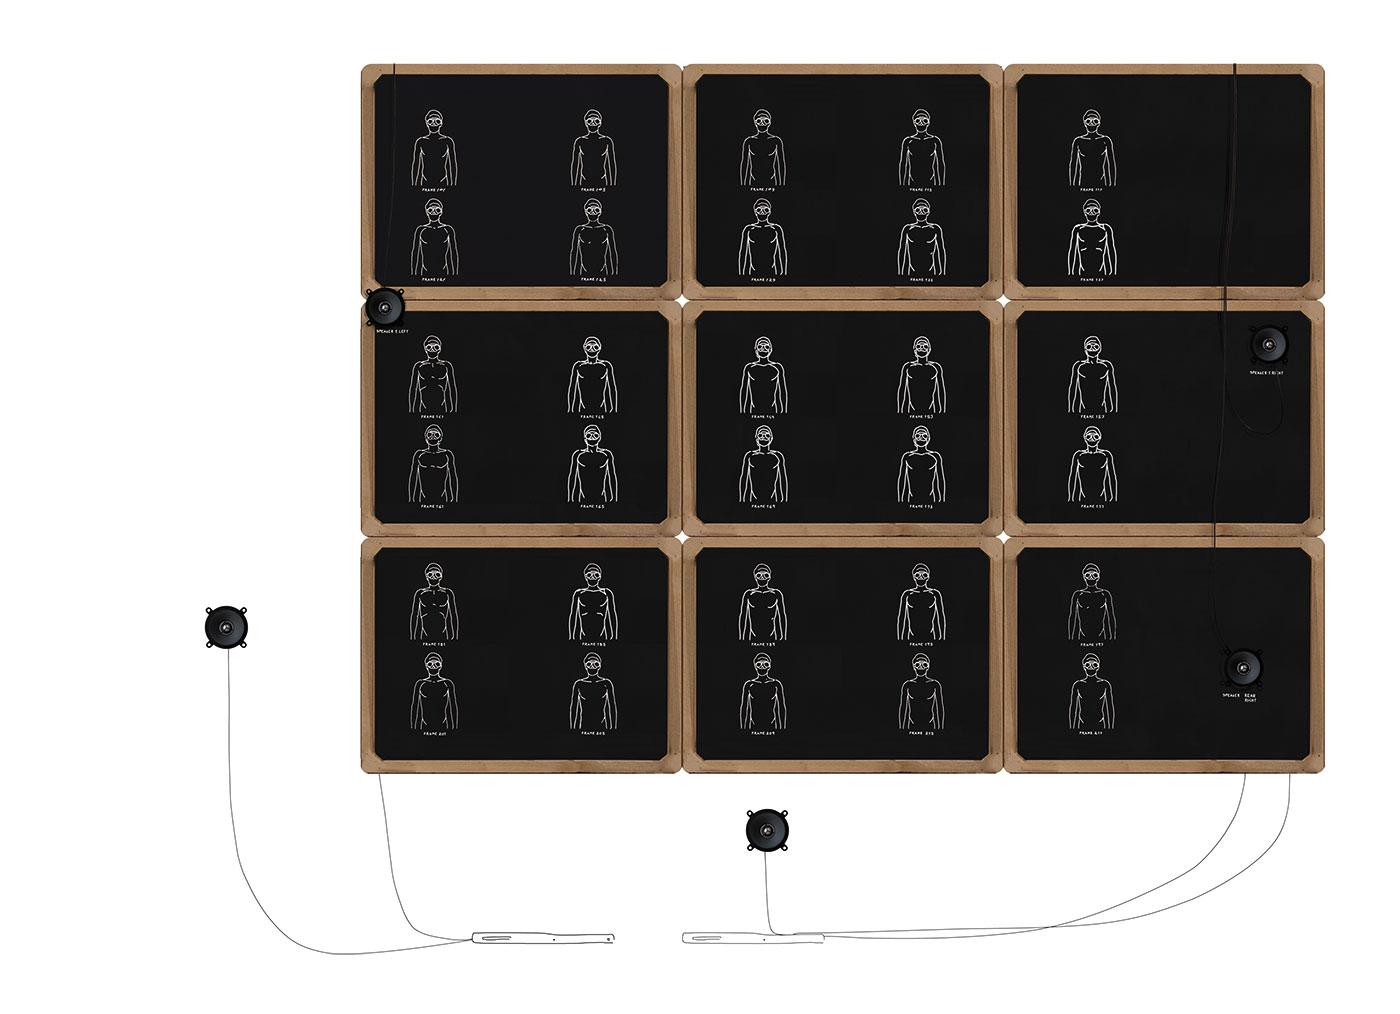 slate, chalk, wood, audio equipment size of boards cm 155 x 115 x 5. 2007